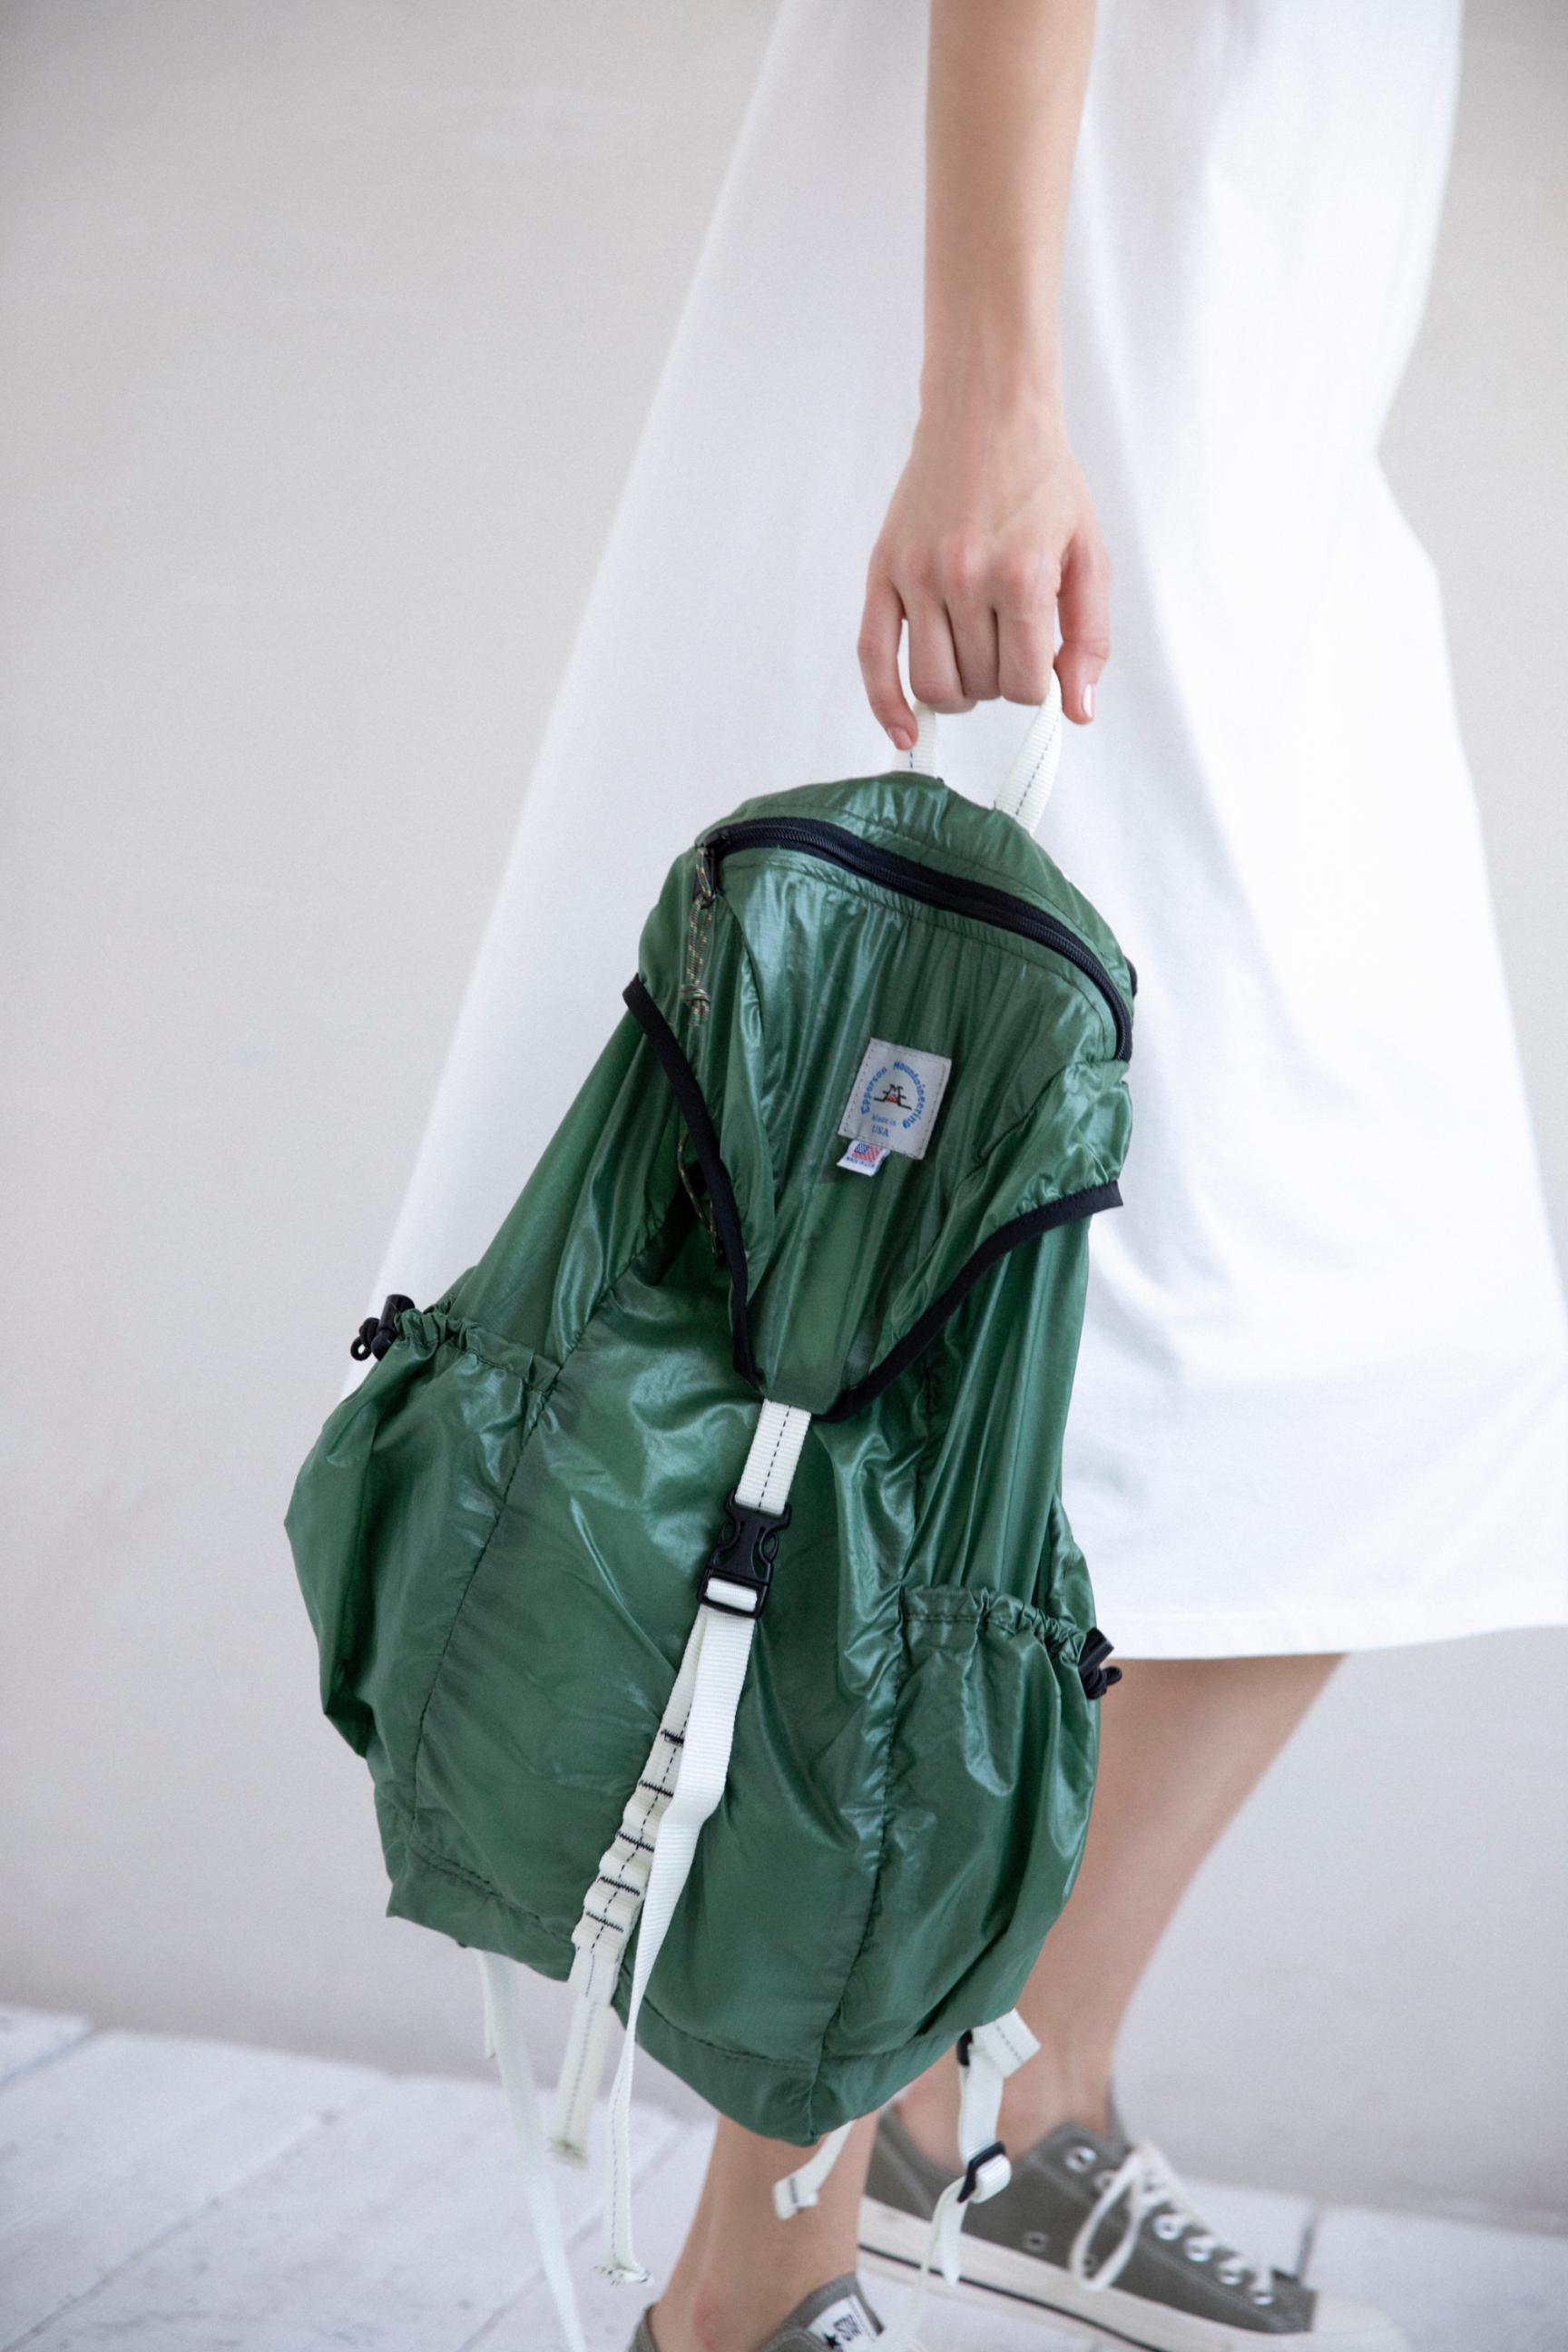 42_1 dress¥23,100 bag¥19,250 shoes¥7,150